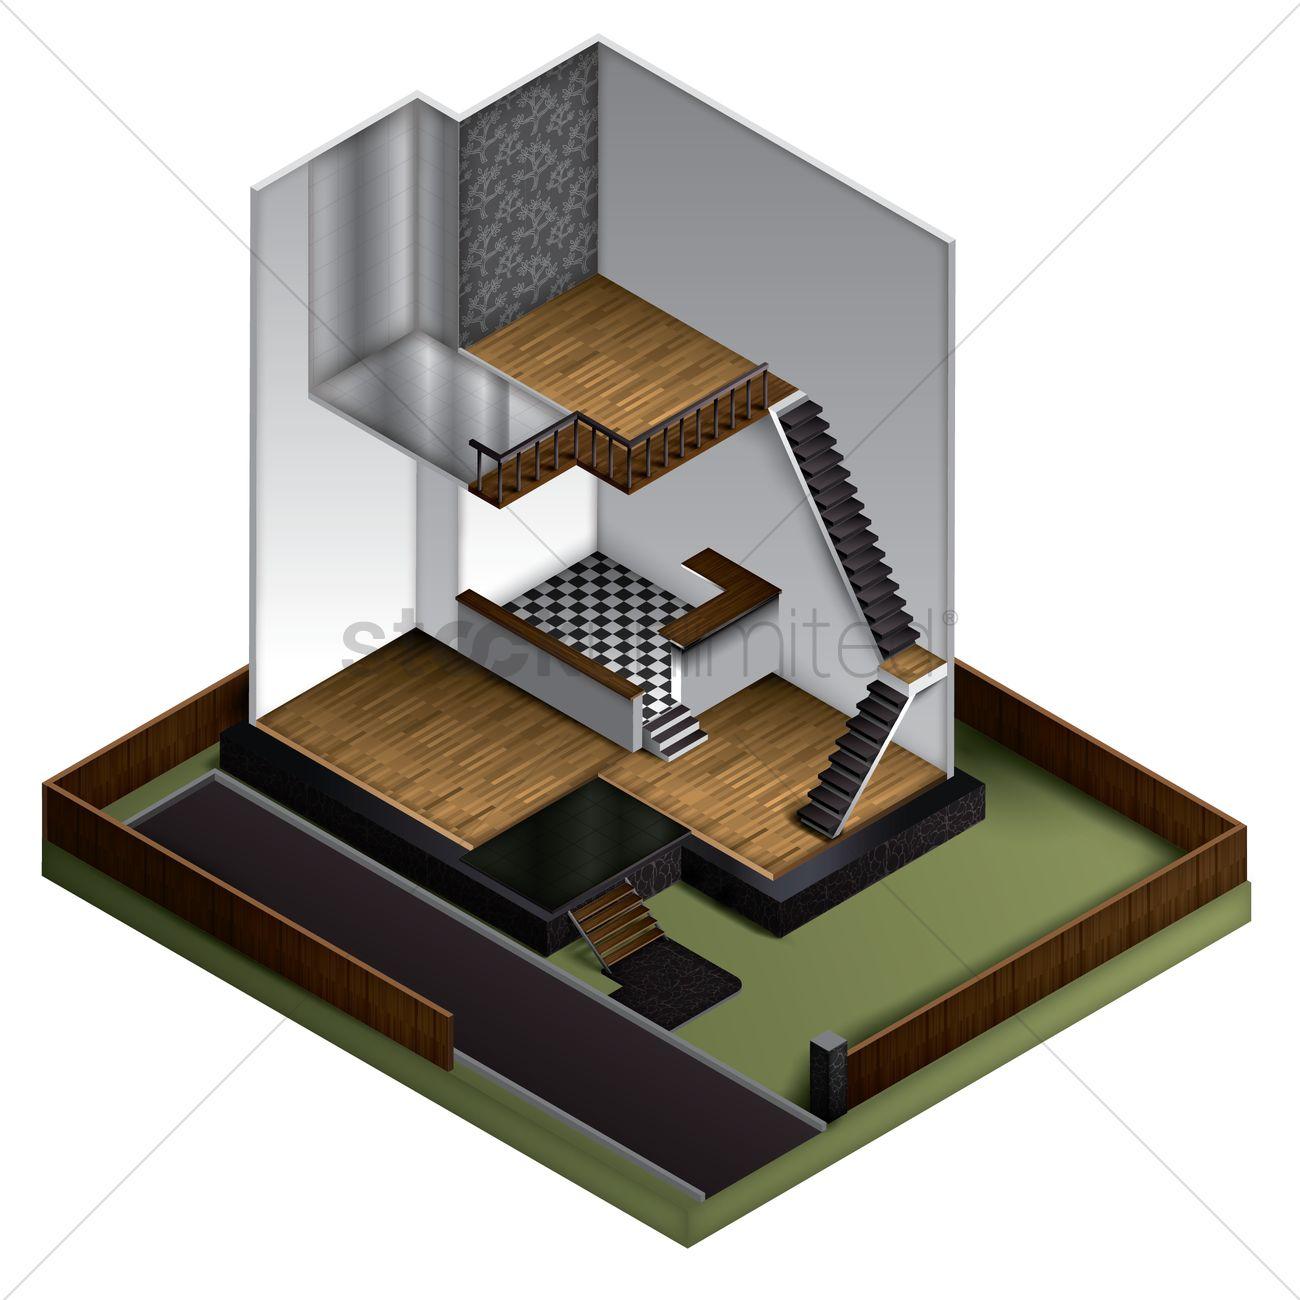 3d Floor Plan Of Modern House Vector Image 1573057 Stockunlimited